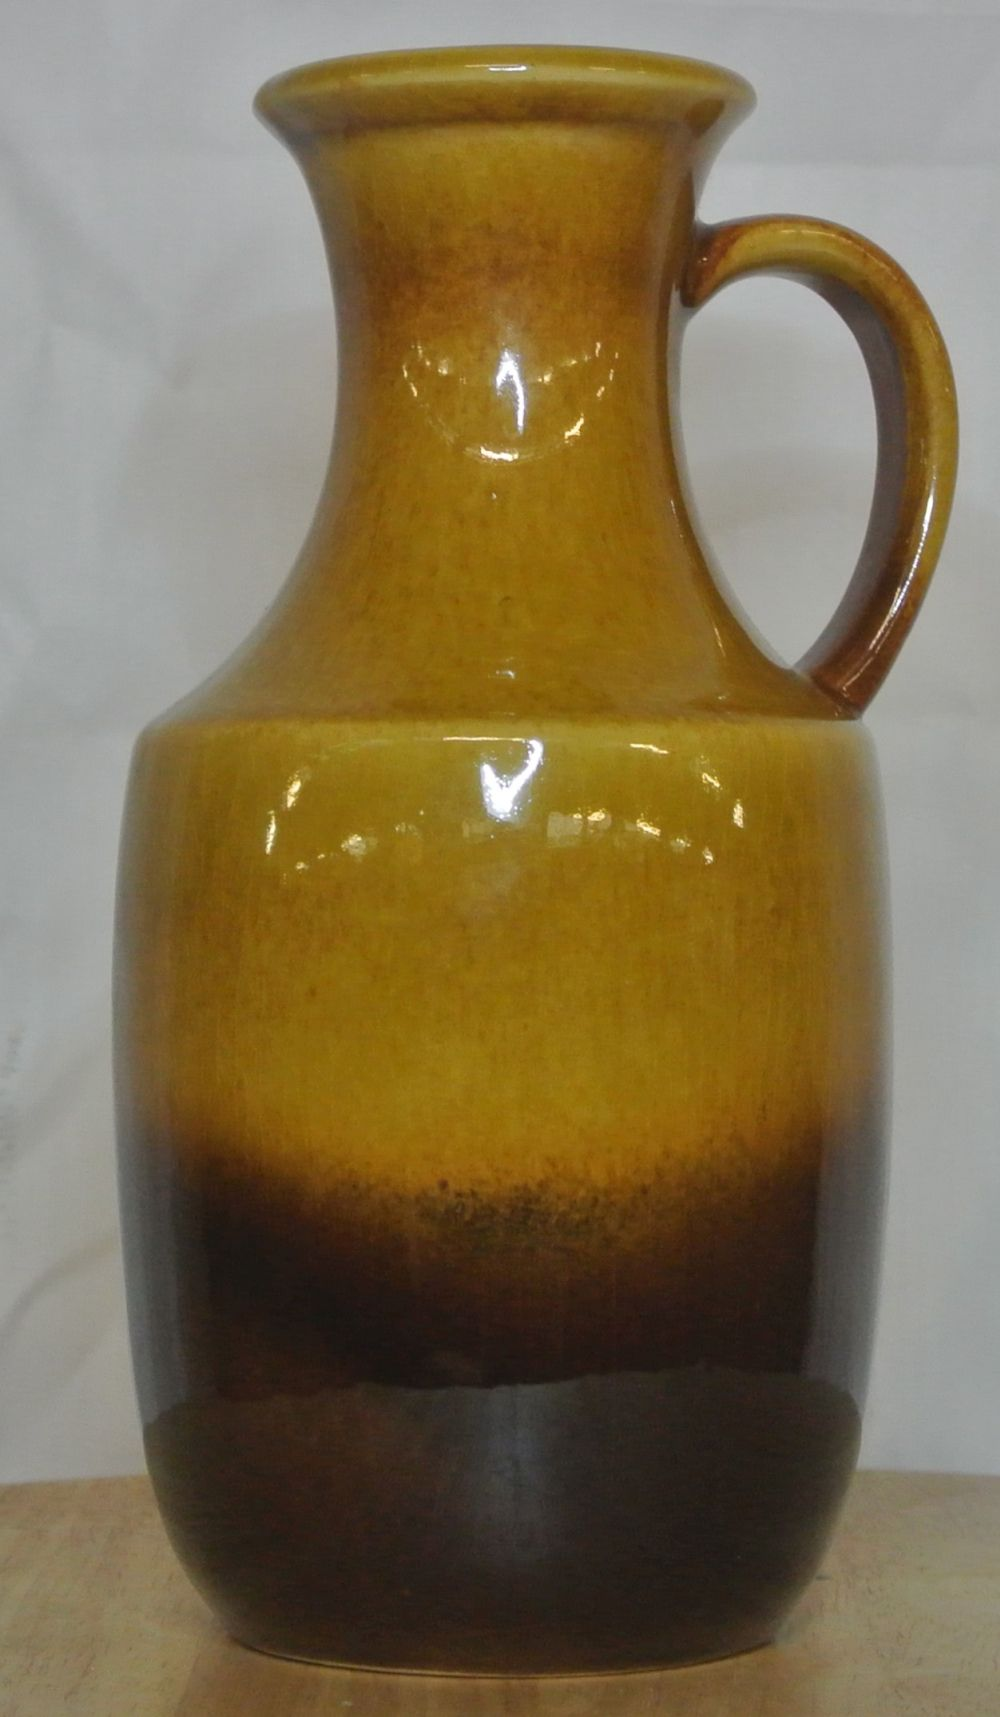 Lot 42: A vintage/ Mid Century Western German 'Fat Lava' jug